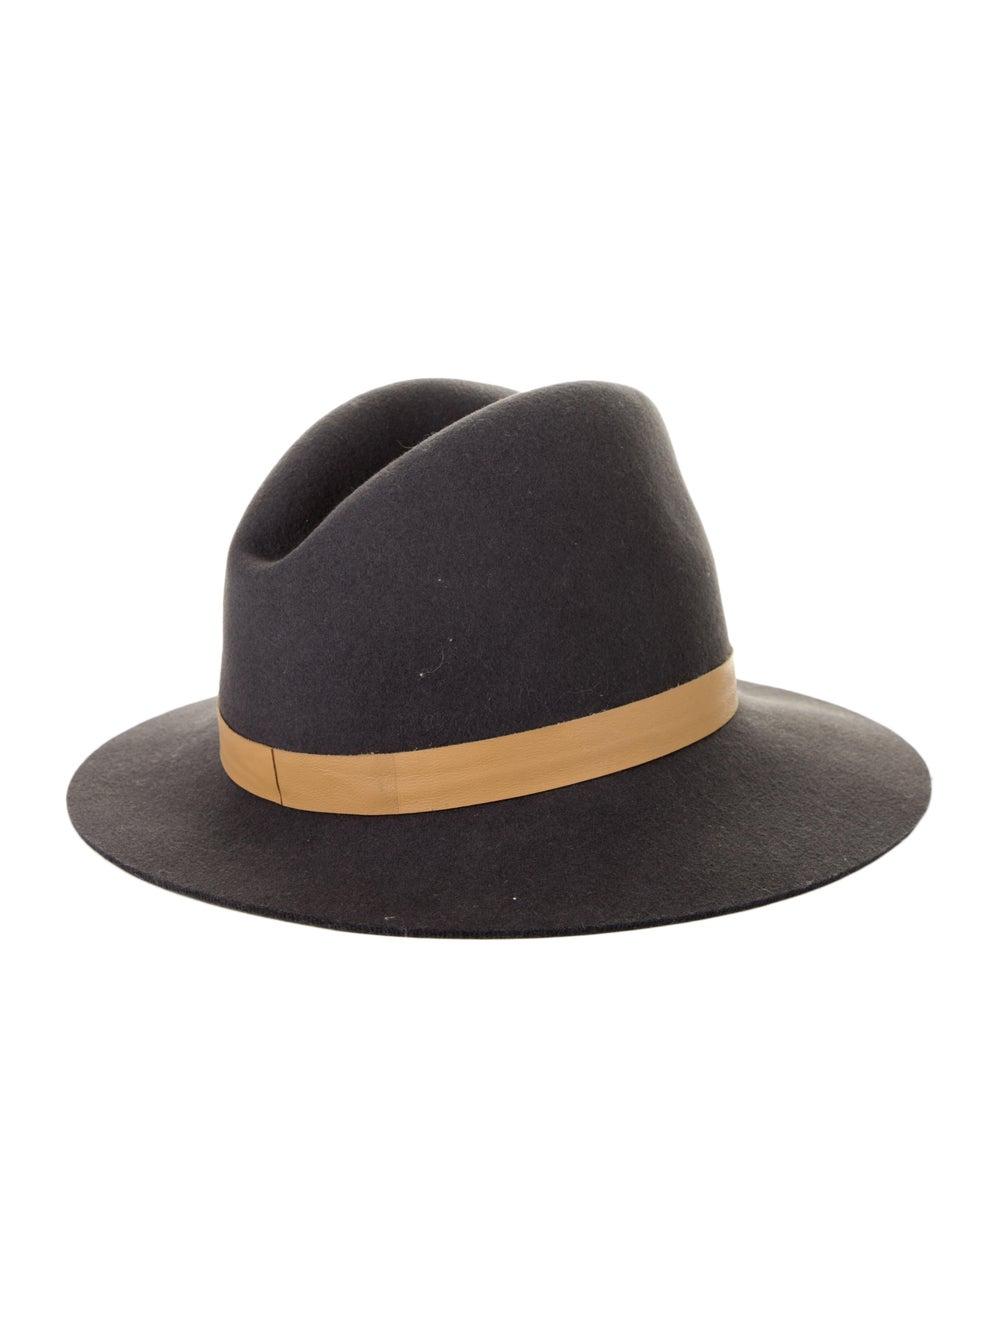 Janessa Leone Wool Brim Hat Grey - image 2